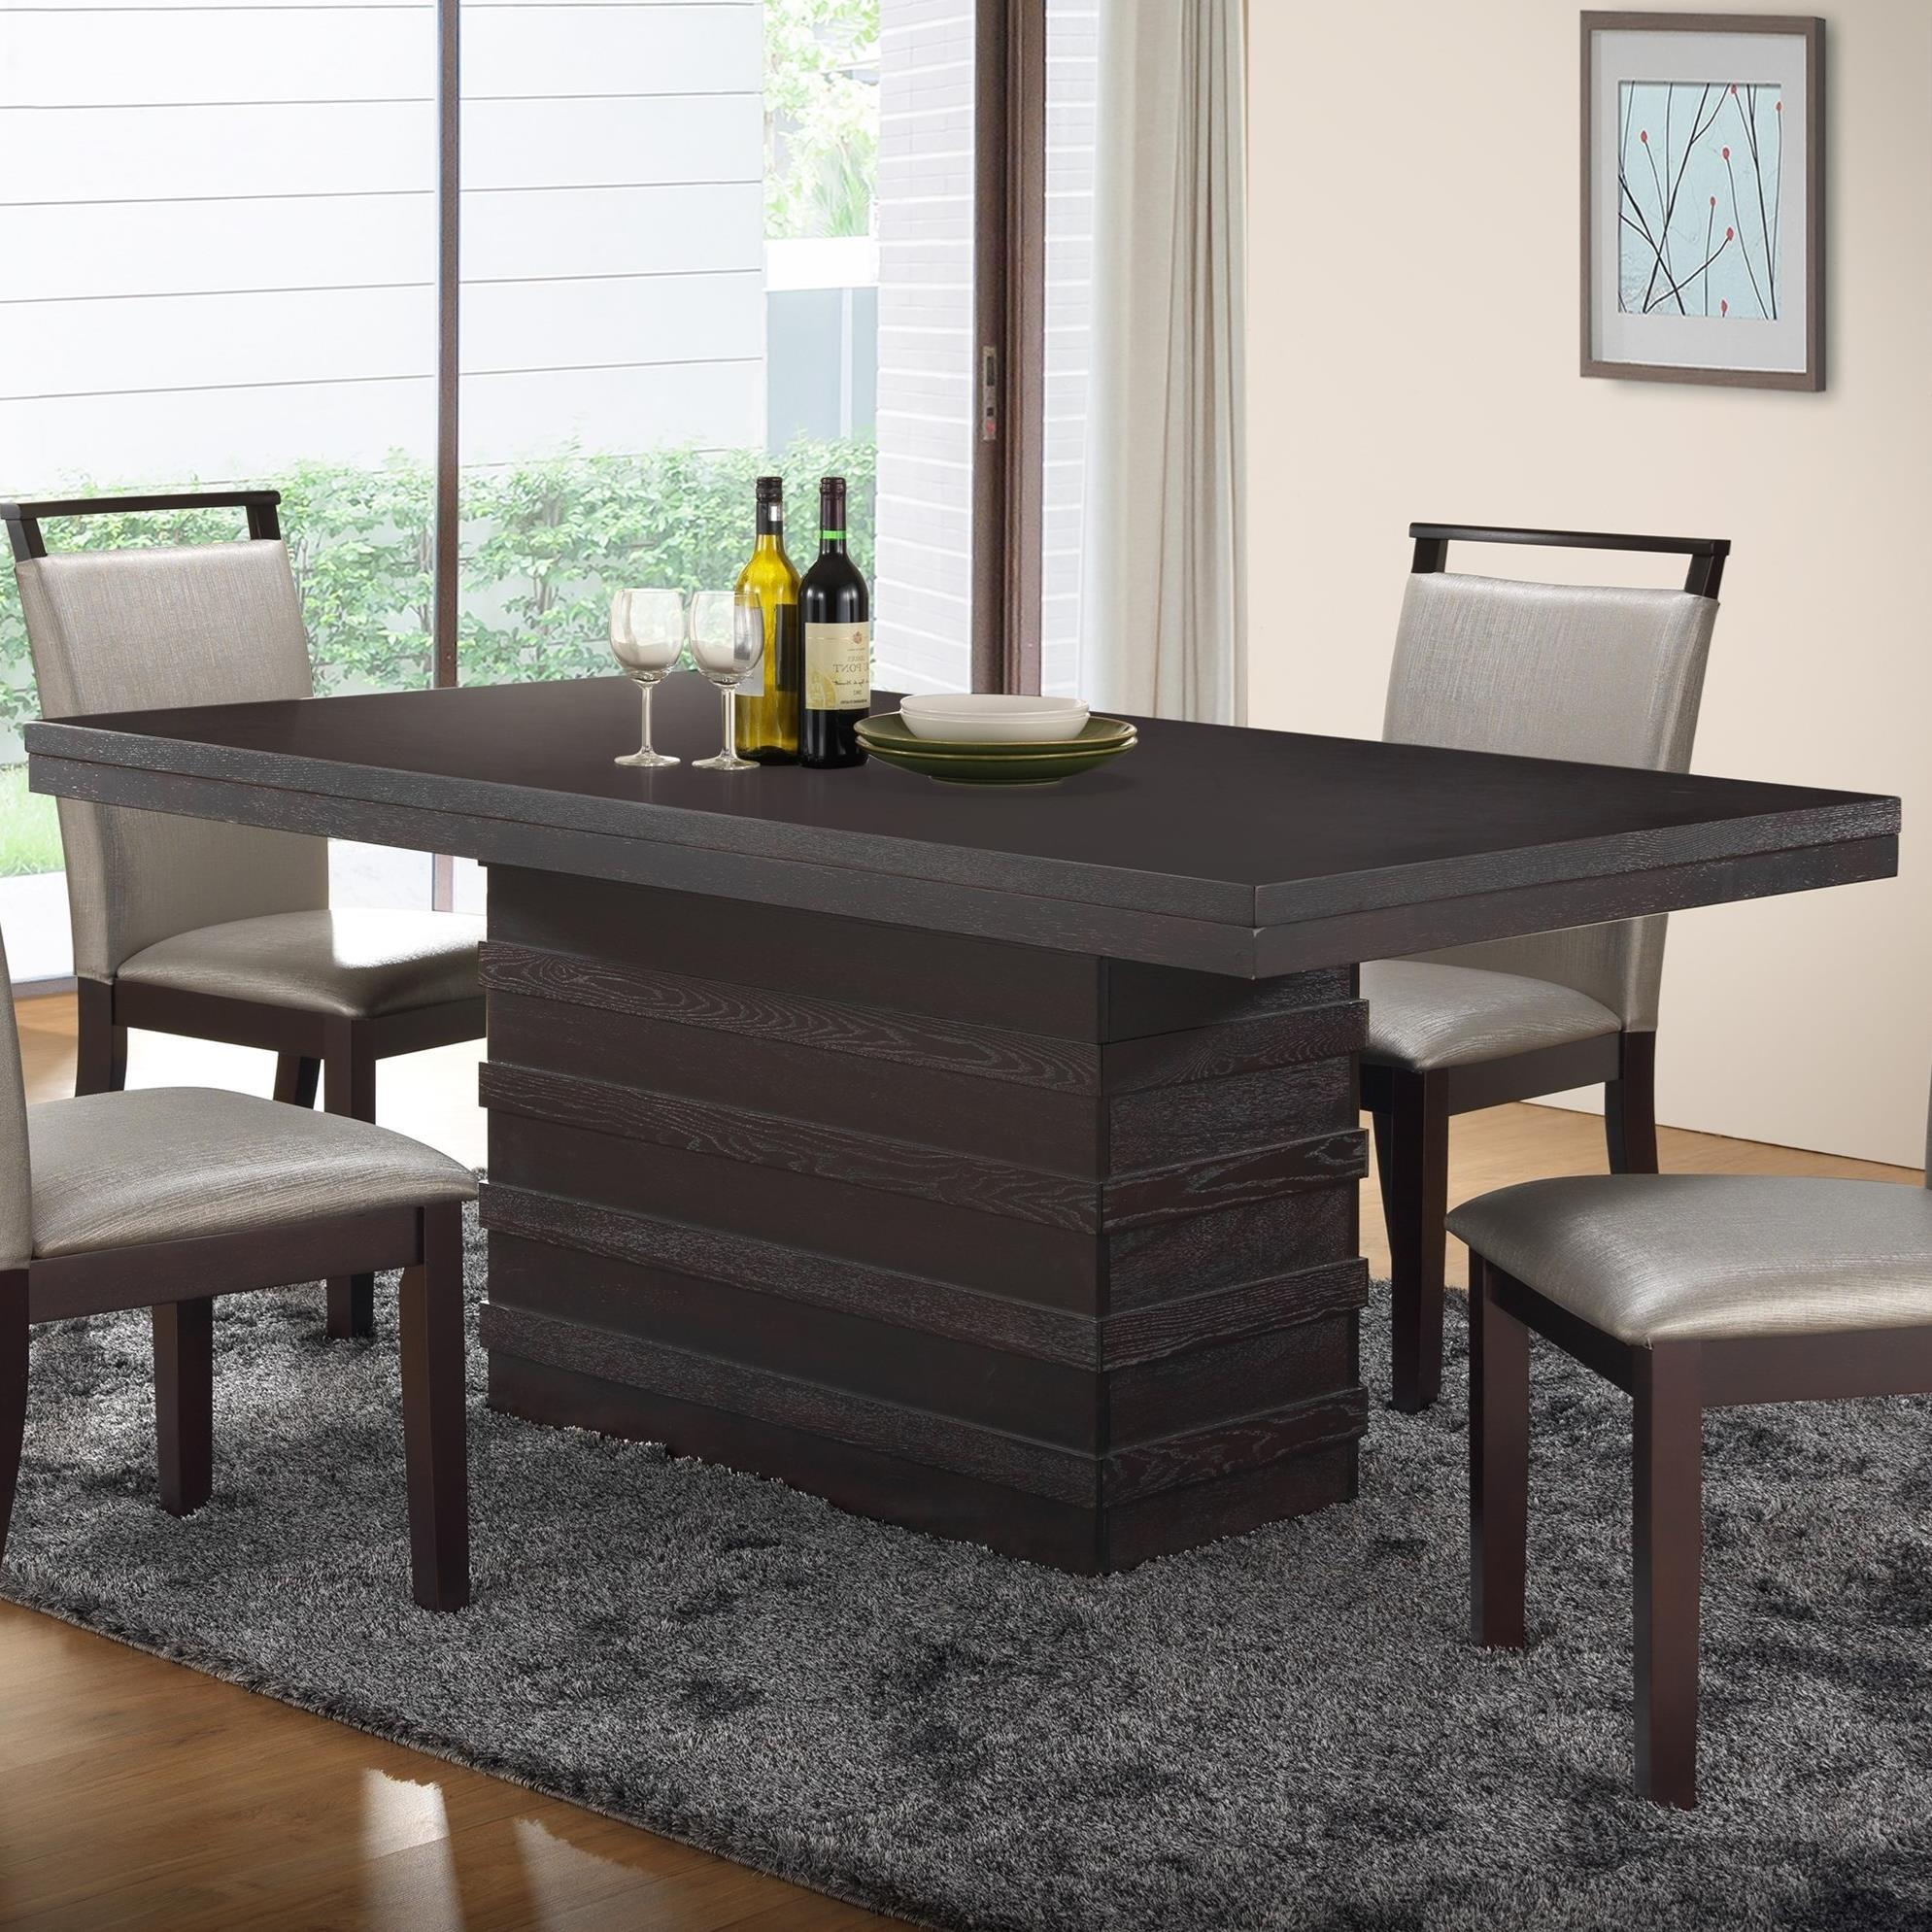 New Classic Natasha Boris Dining Table - Item Number: D3972-10W